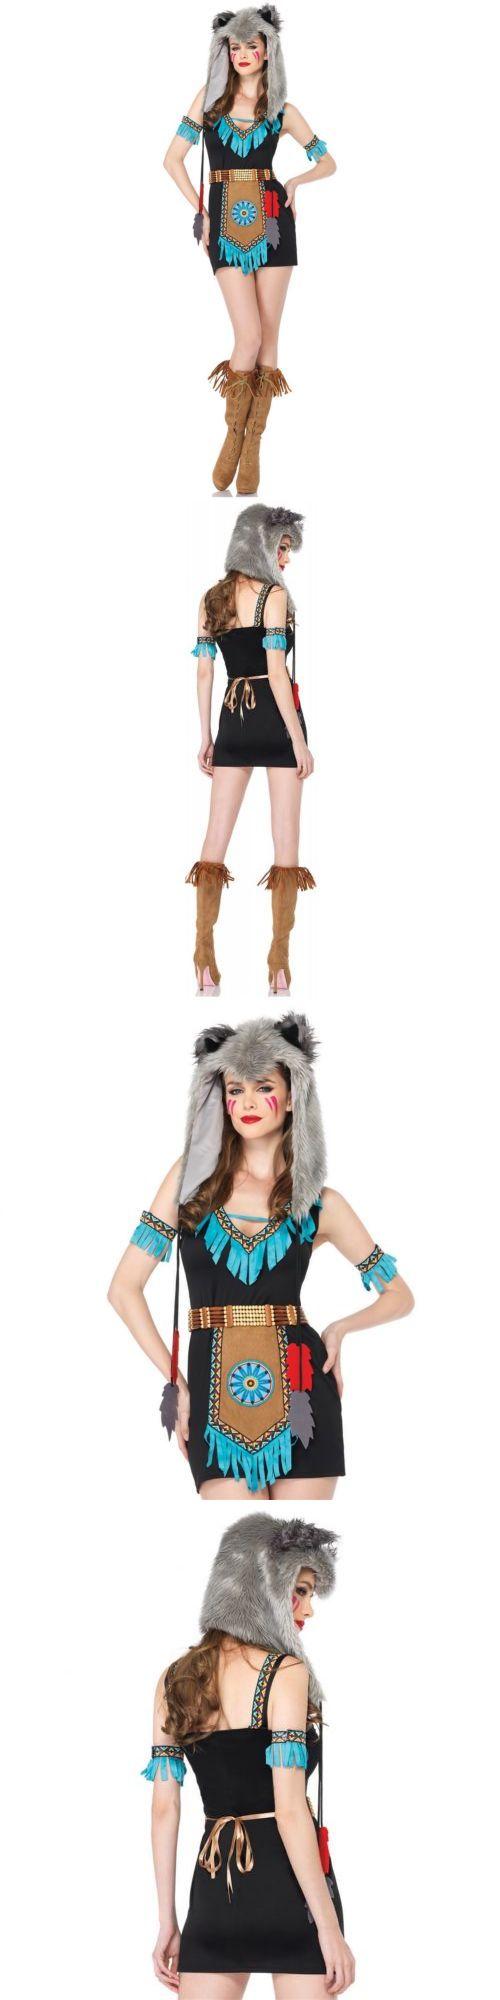 Halloween Costumes Women: Indian Costume Adult Warrior Princess Halloween Fancy Dress -> BUY IT NOW ONLY: $32.29 on eBay!